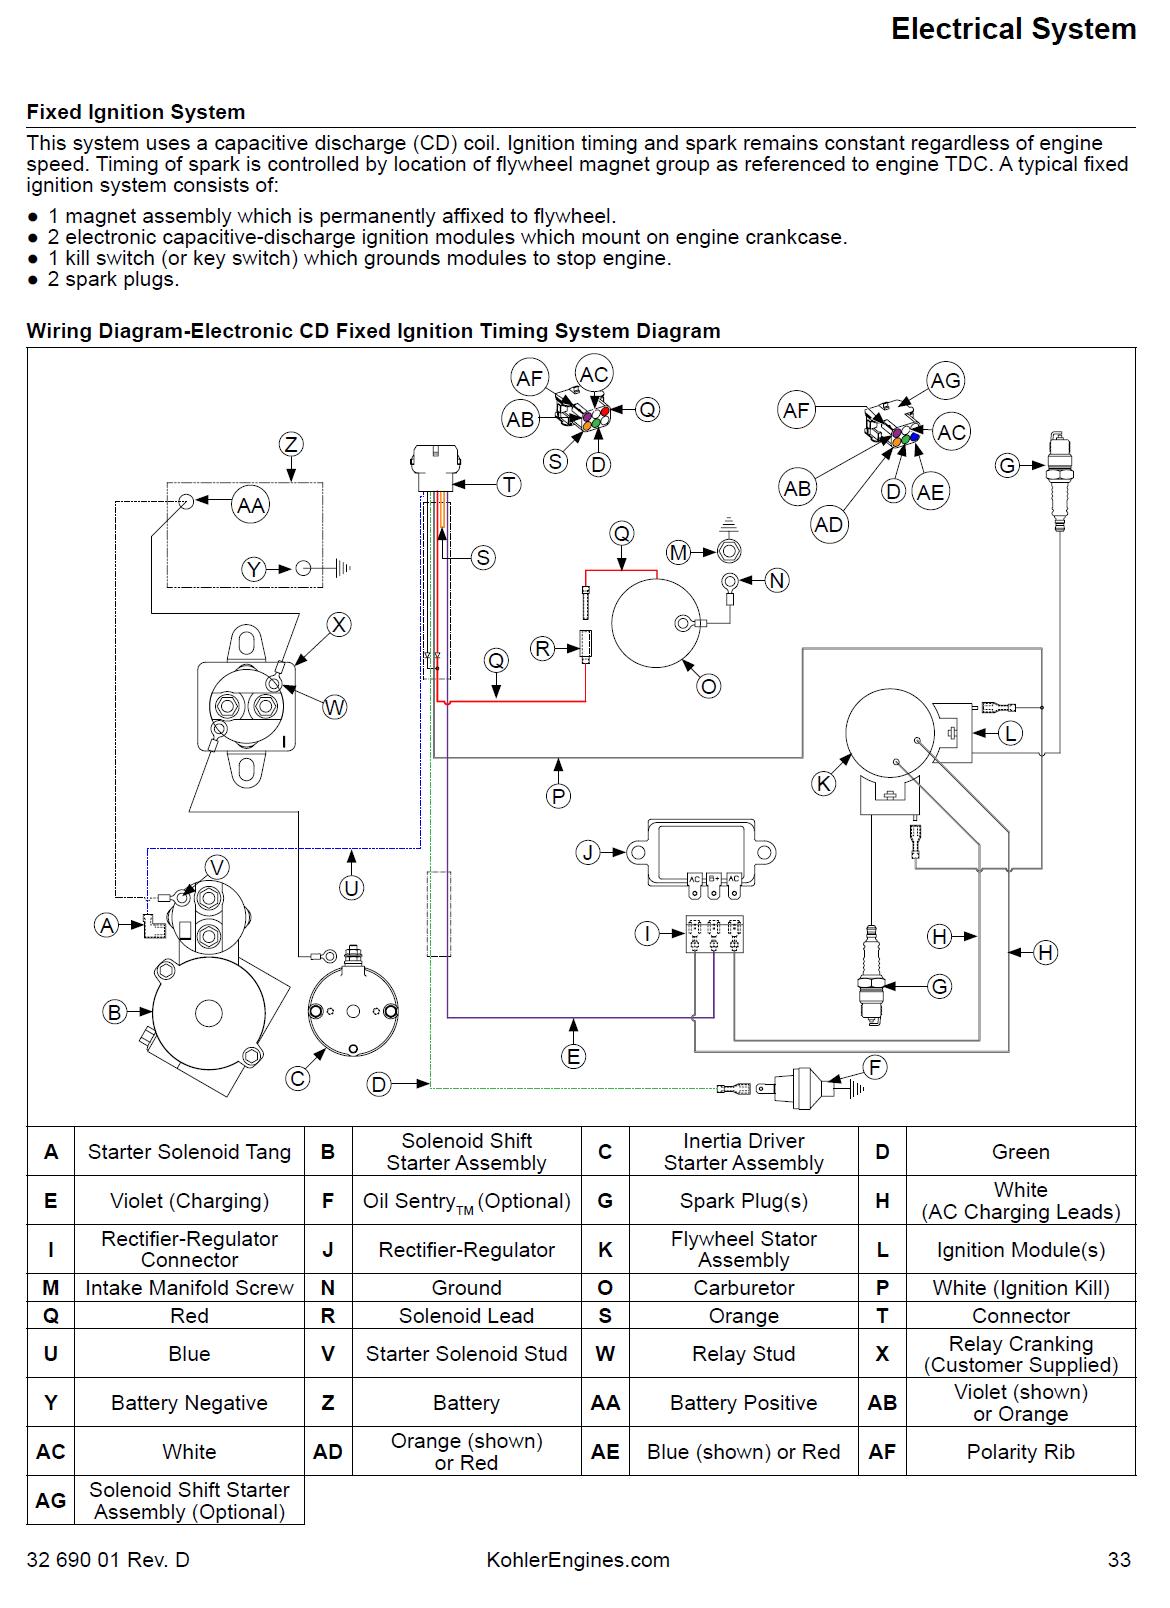 ch20s kohler engine wiring diagram wv 3941  key switch wiring diagram in addition kohler engine  key switch wiring diagram in addition